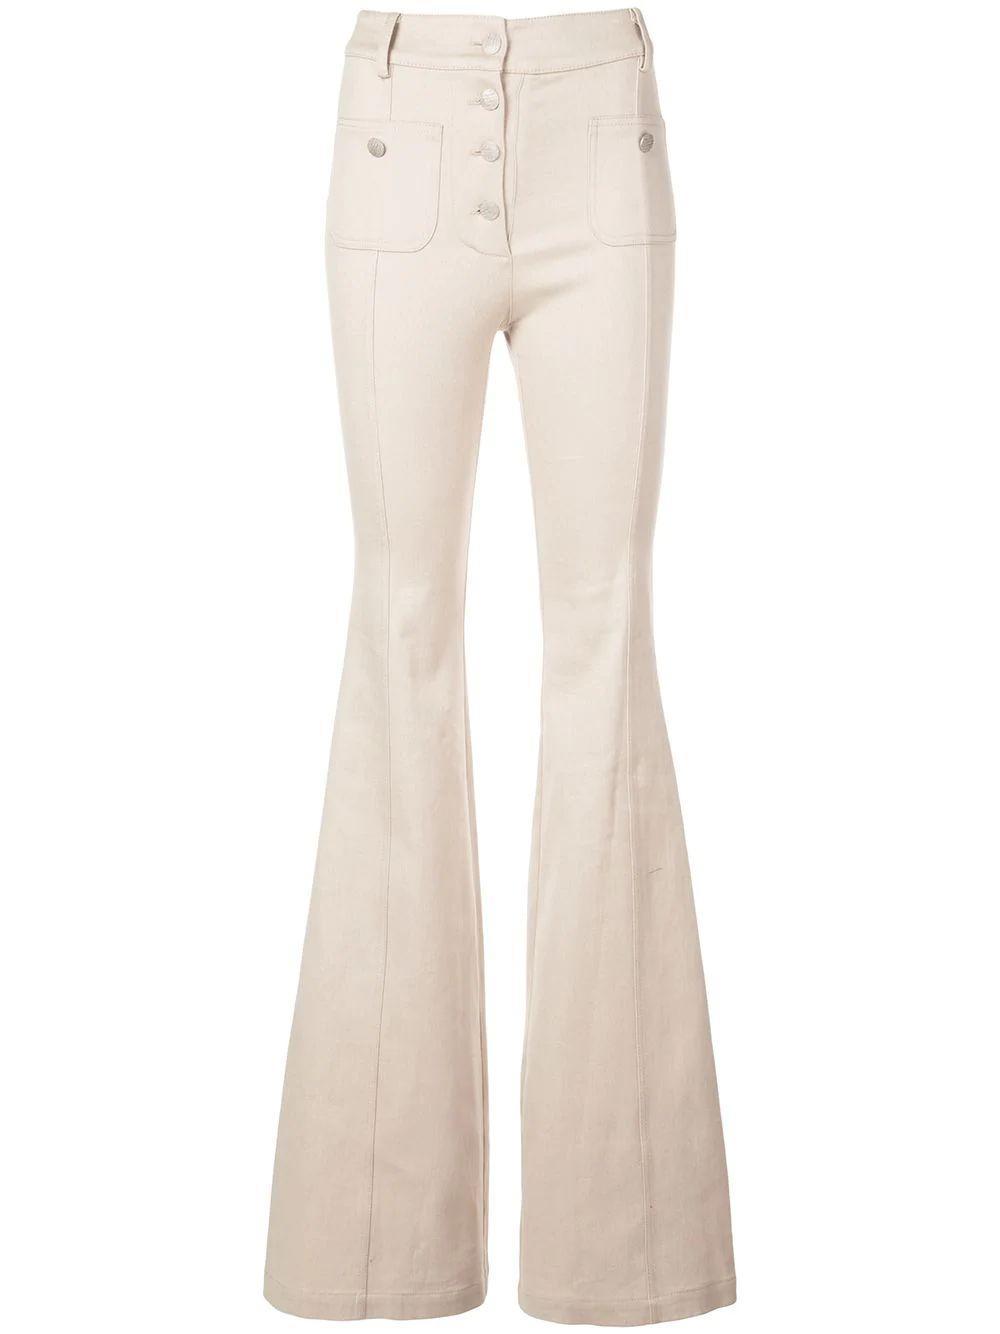 Helene High Waist Flare Button Up Jean